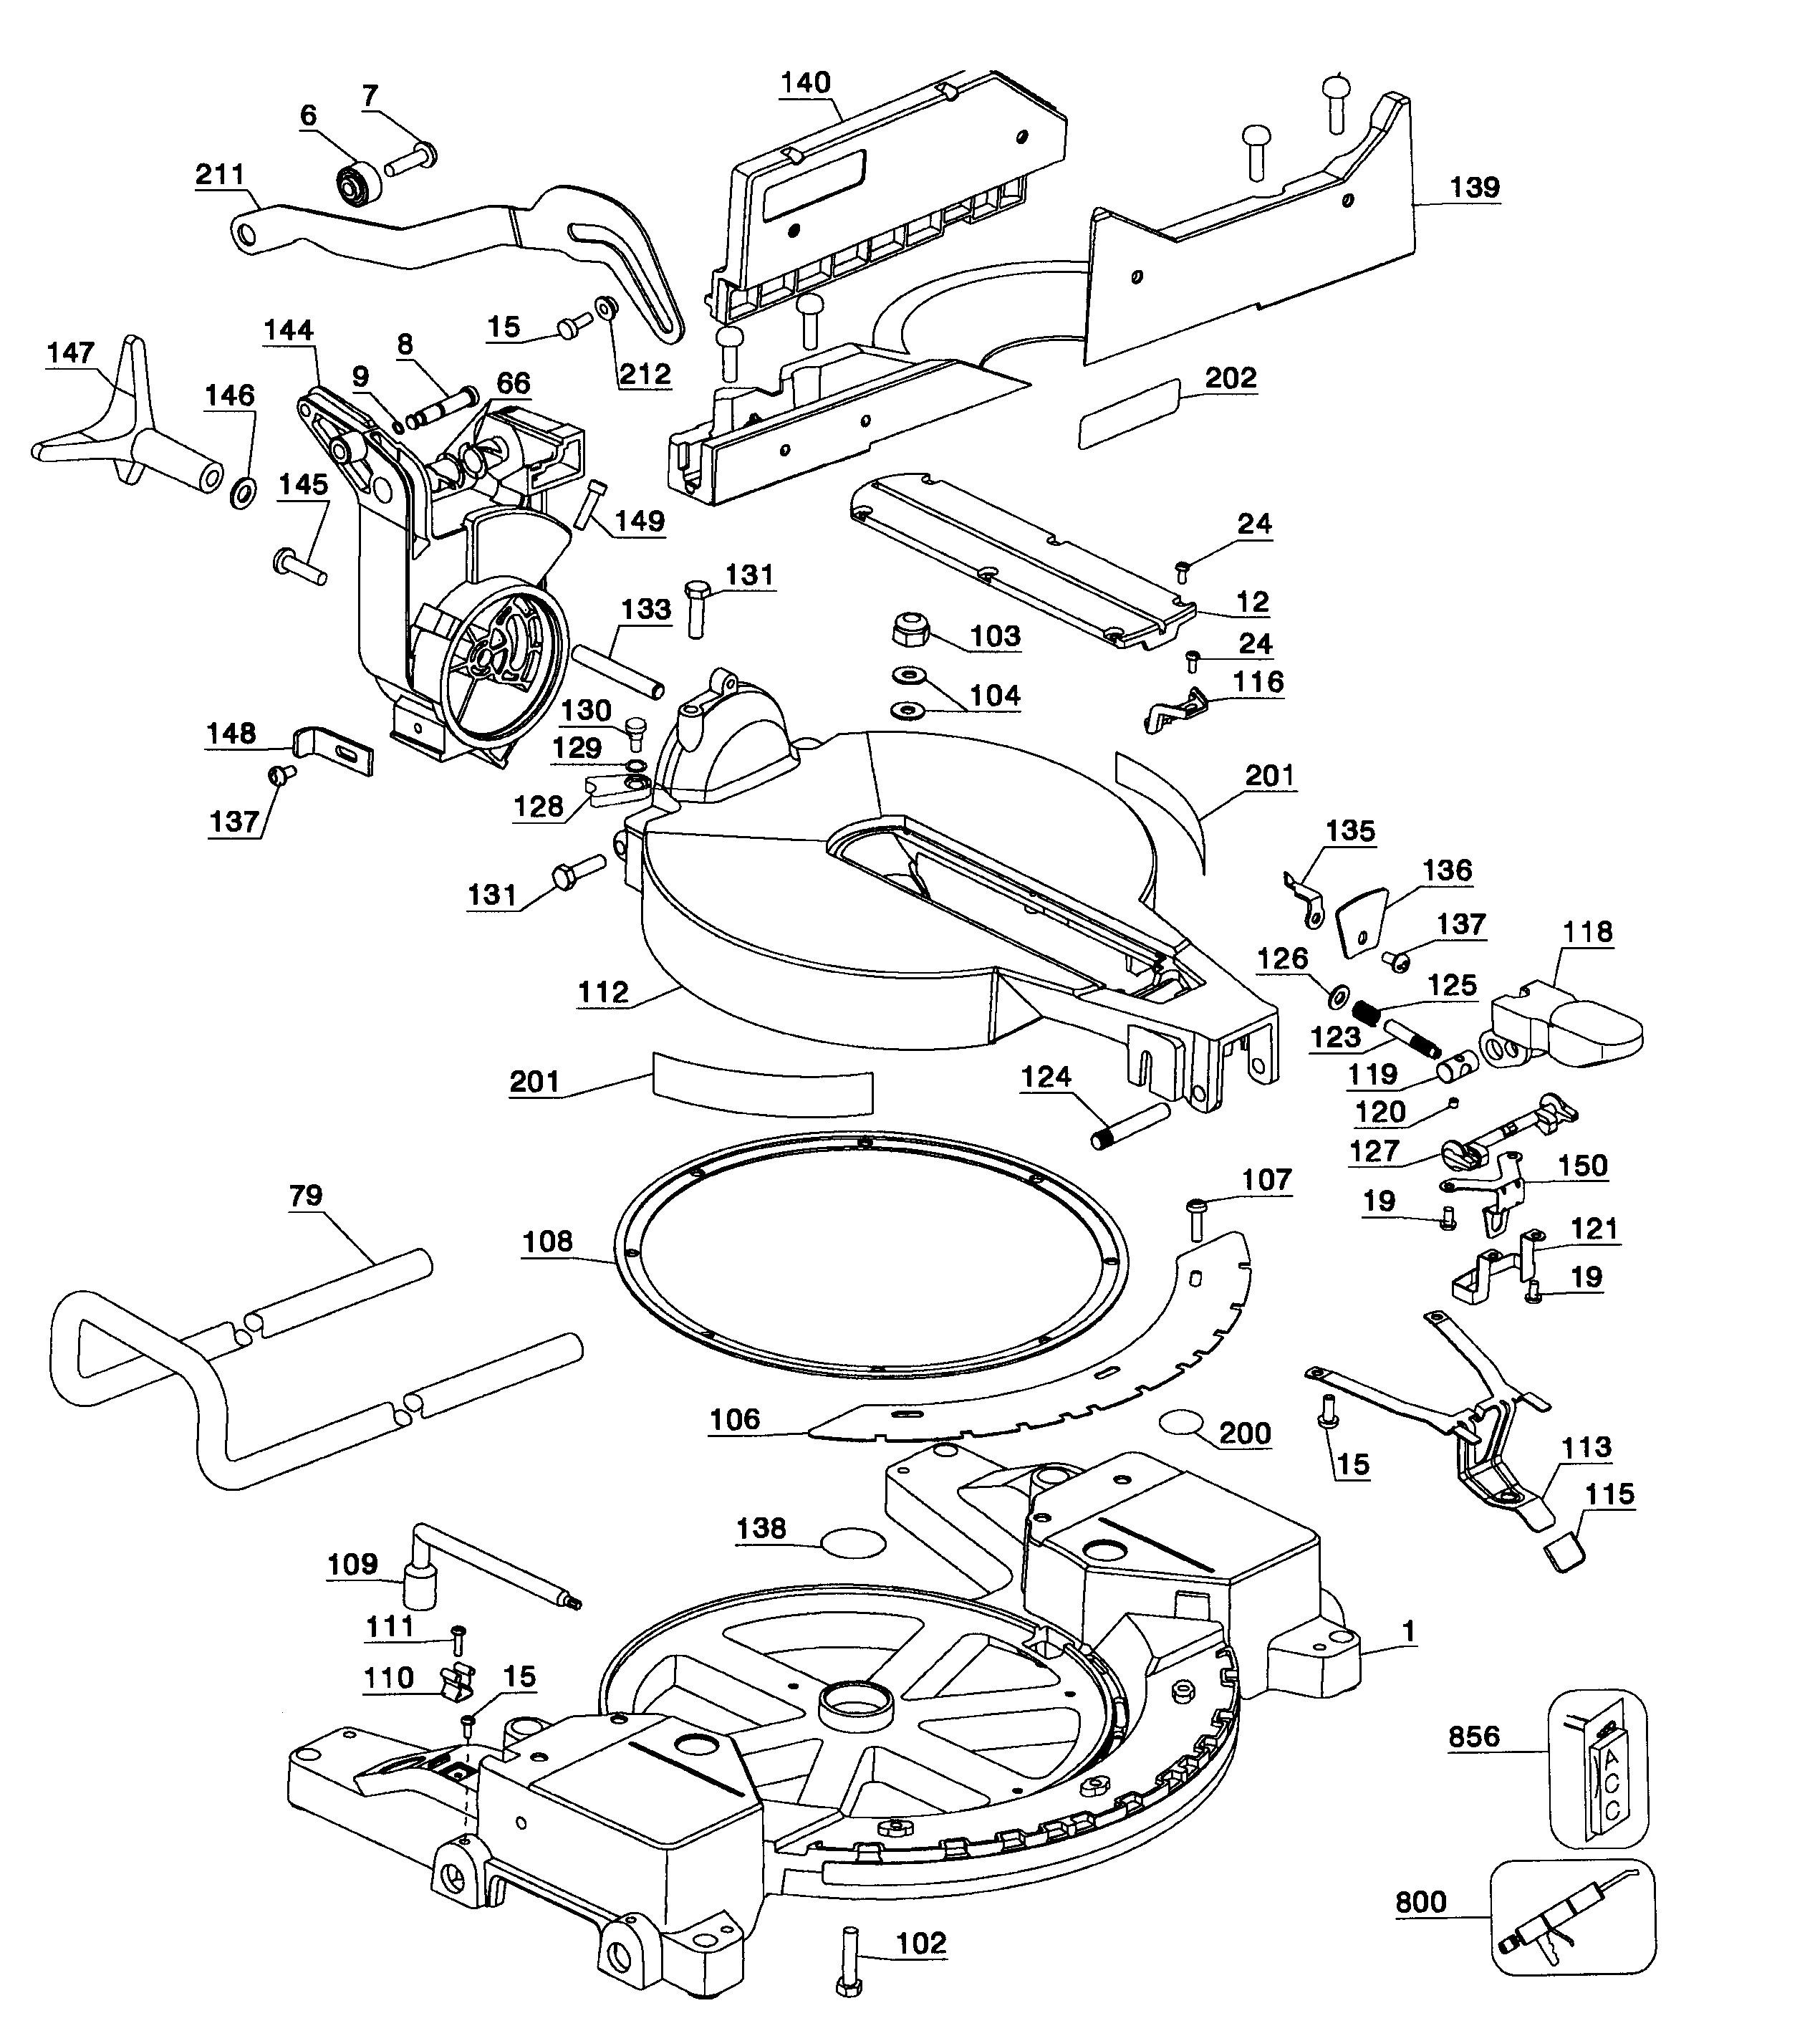 Dewalt Miter Saw Parts Diagram Dewalt Model Dw715 Type1 Miter Saw Genuine Parts Of Dewalt Miter Saw Parts Diagram